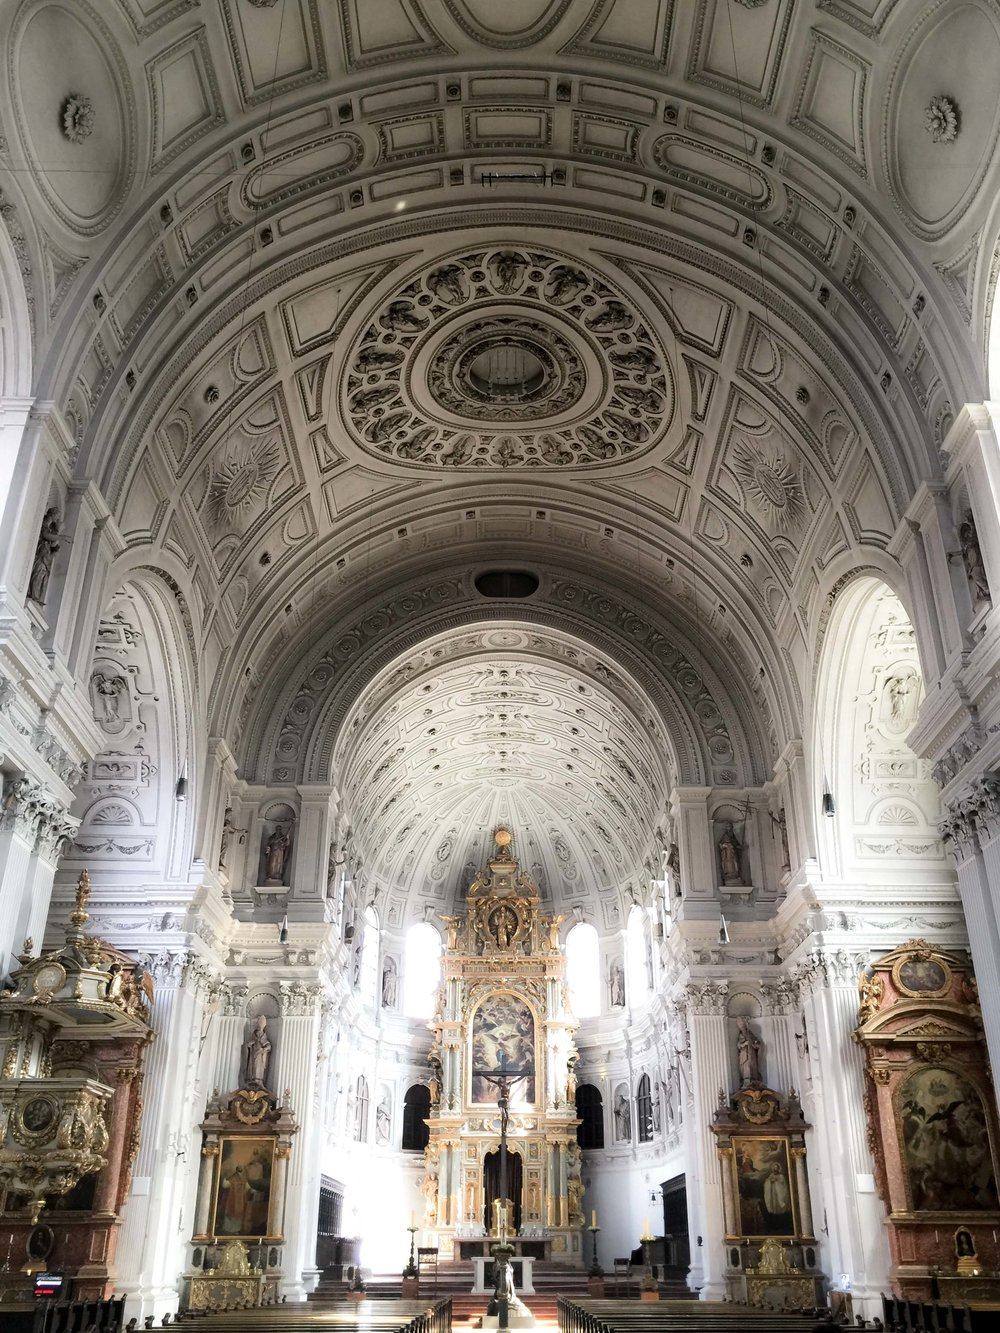 Munich - The Frauenkirche Church